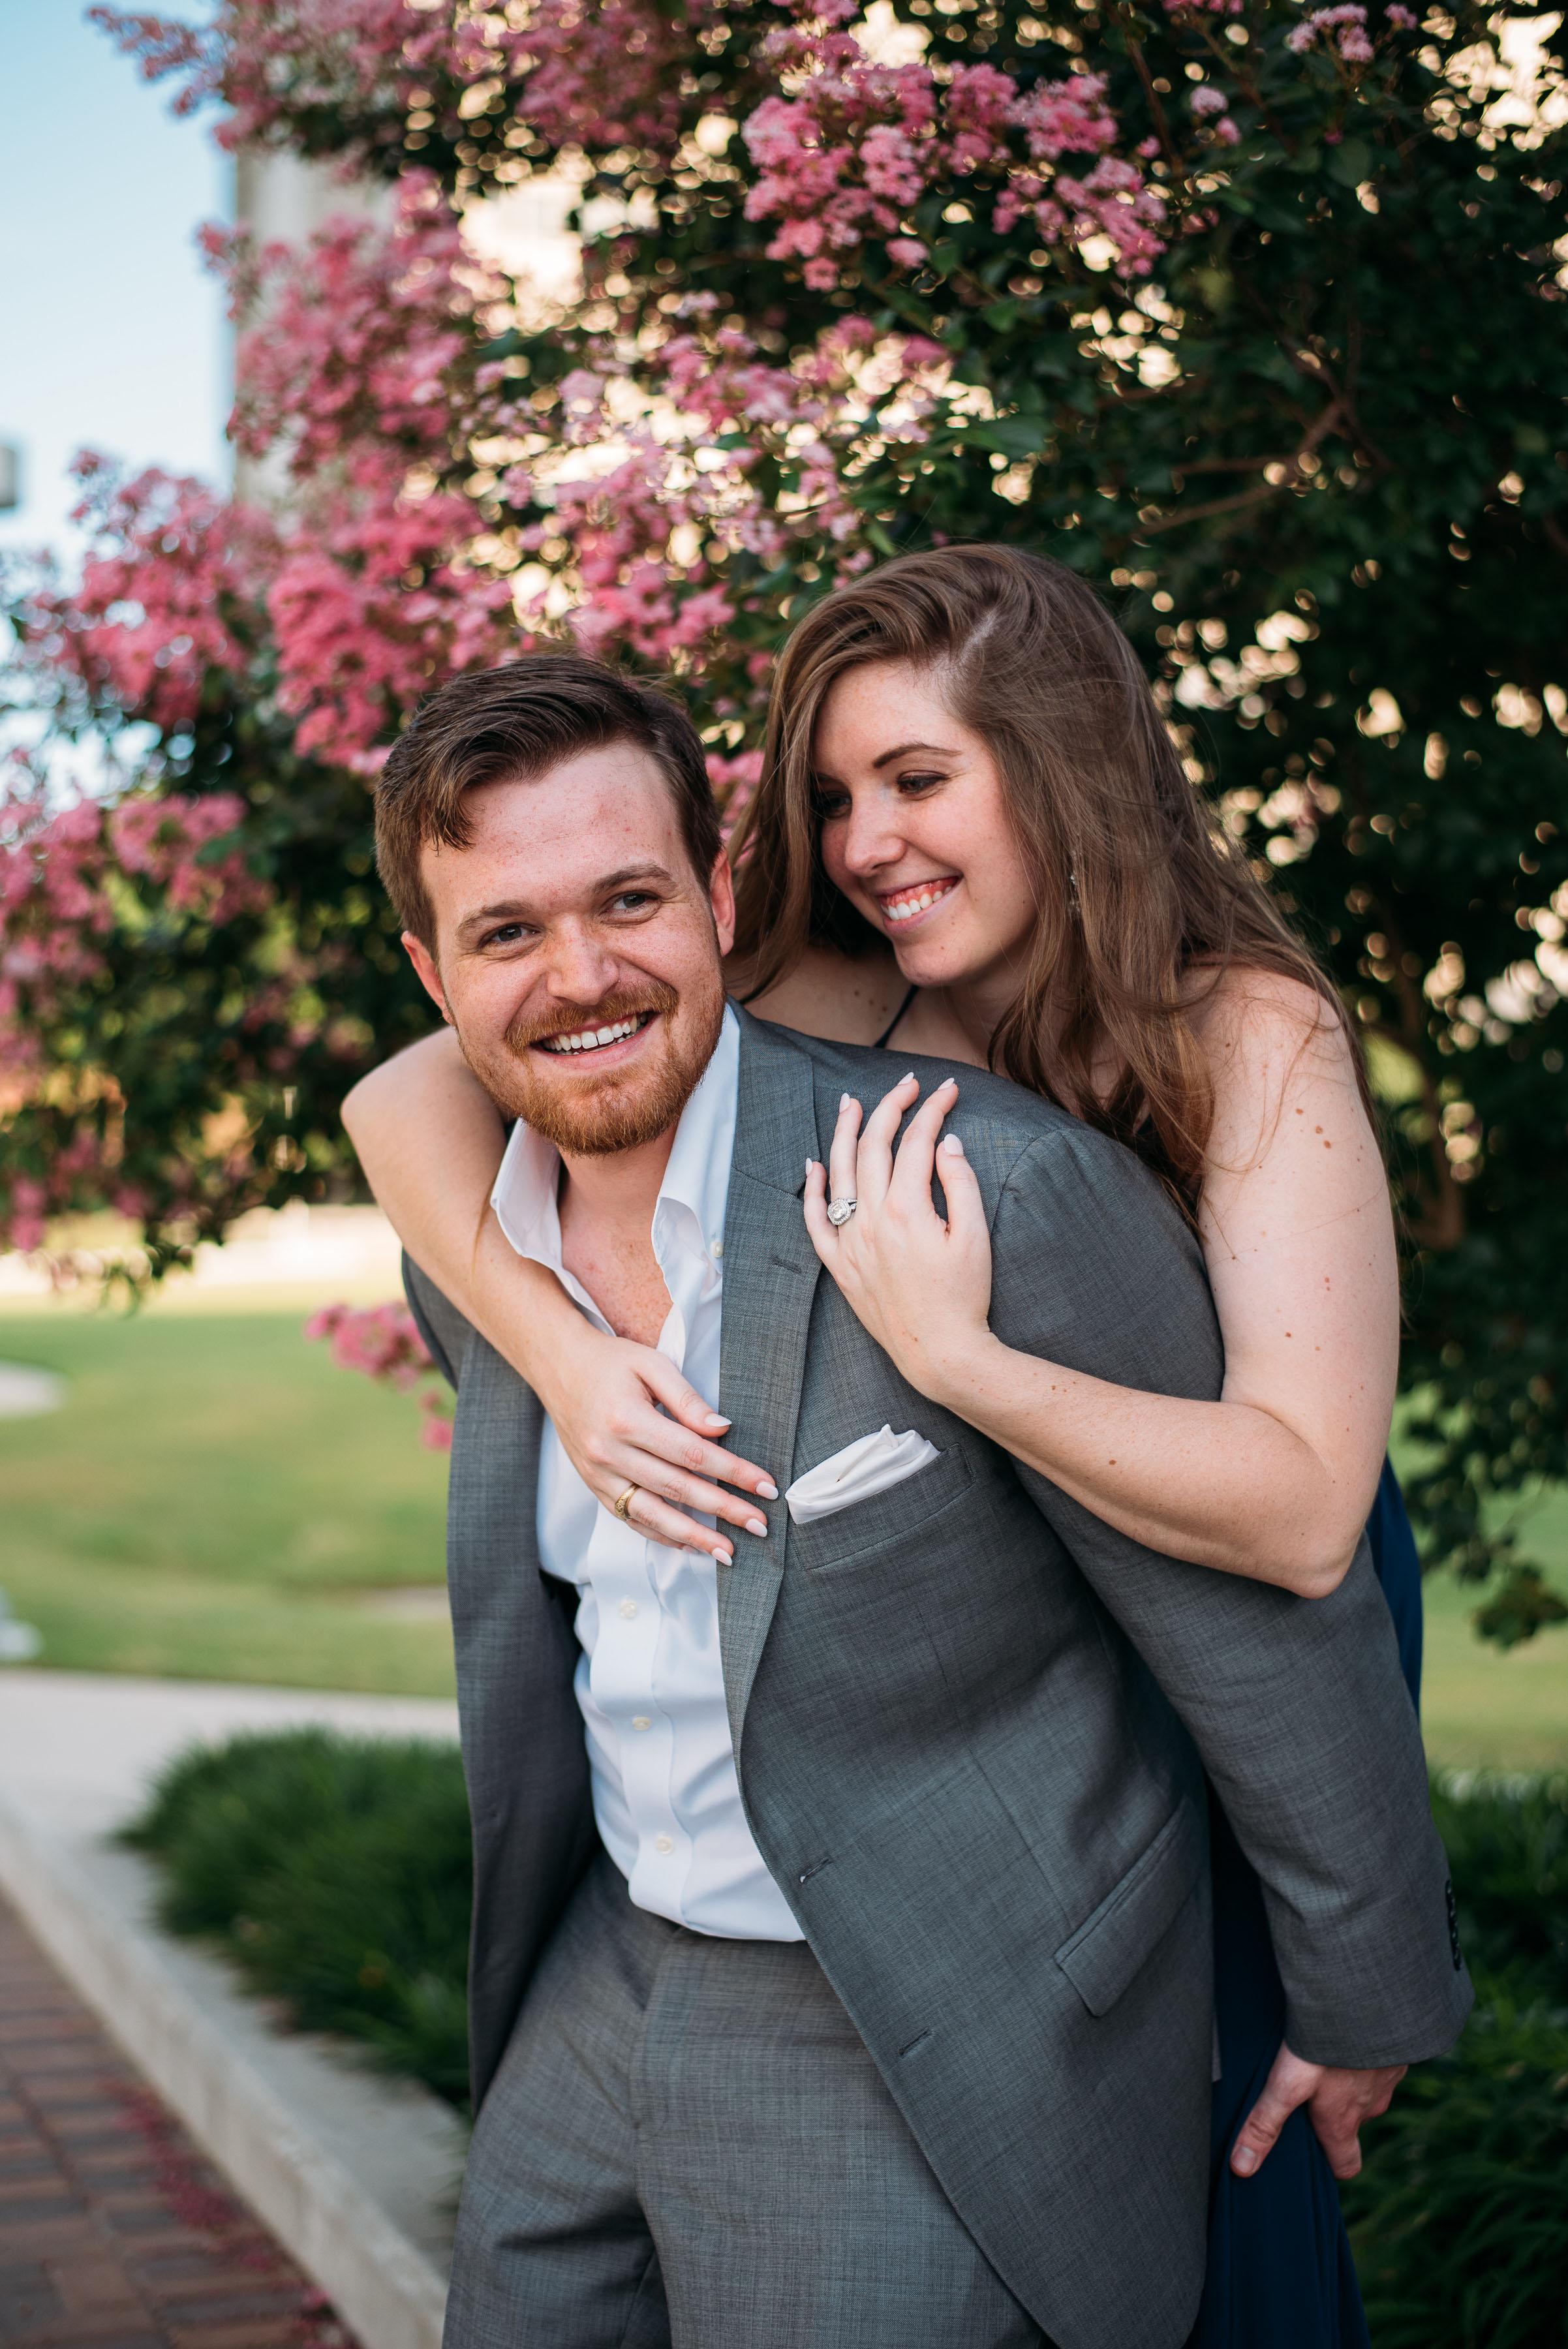 Texas-A&M-University-Engagement-College-Station-Wedding-Photographer-San-Angel-Photo-Mark-Johanna-Century-Tree-18.jpg